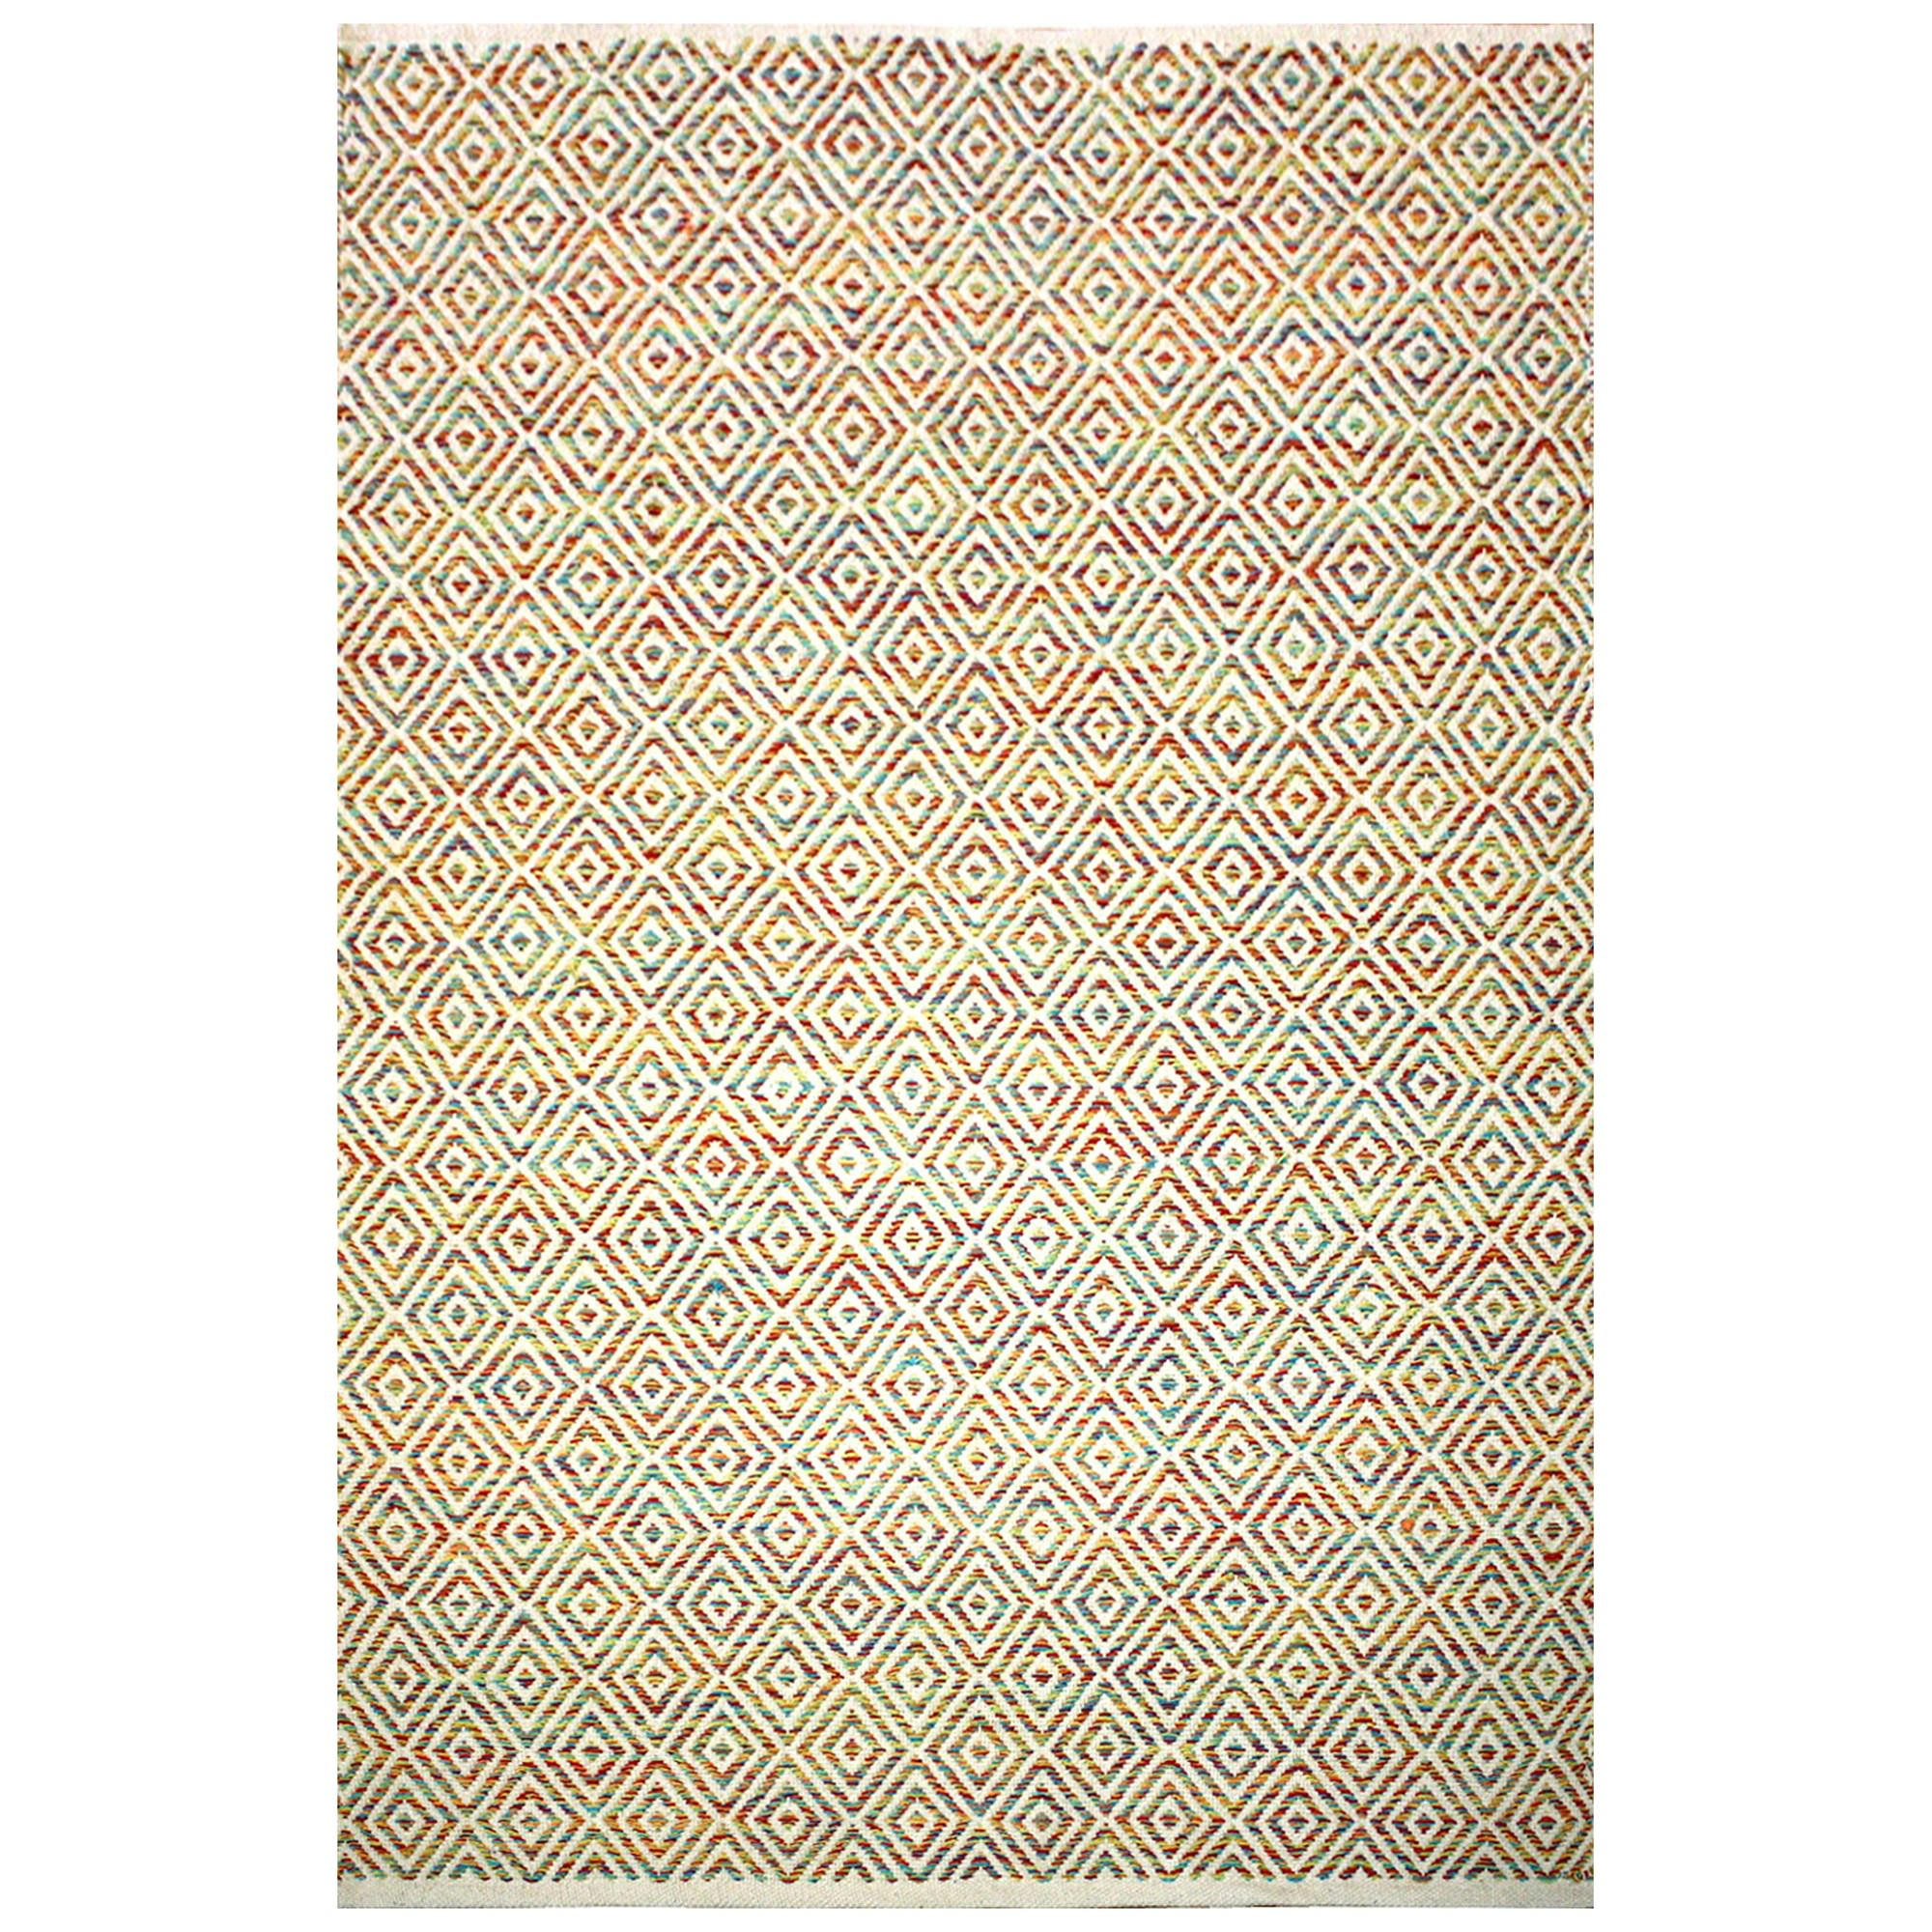 Wilcannia Handwoven Cotton Rug, 165x115cm, Multi